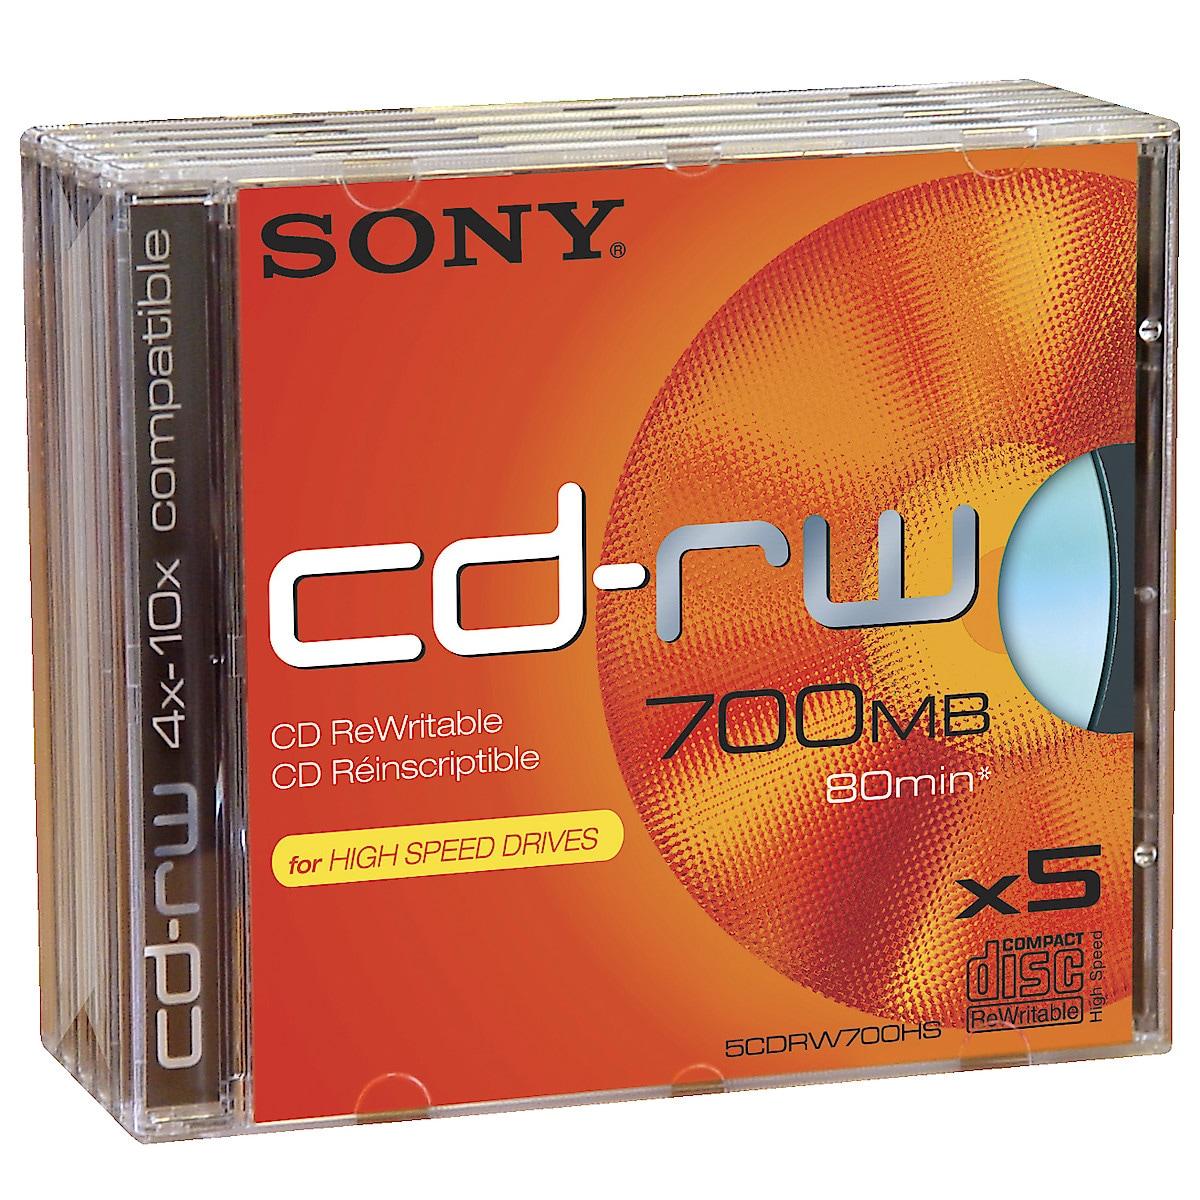 CD-RW, 80 min